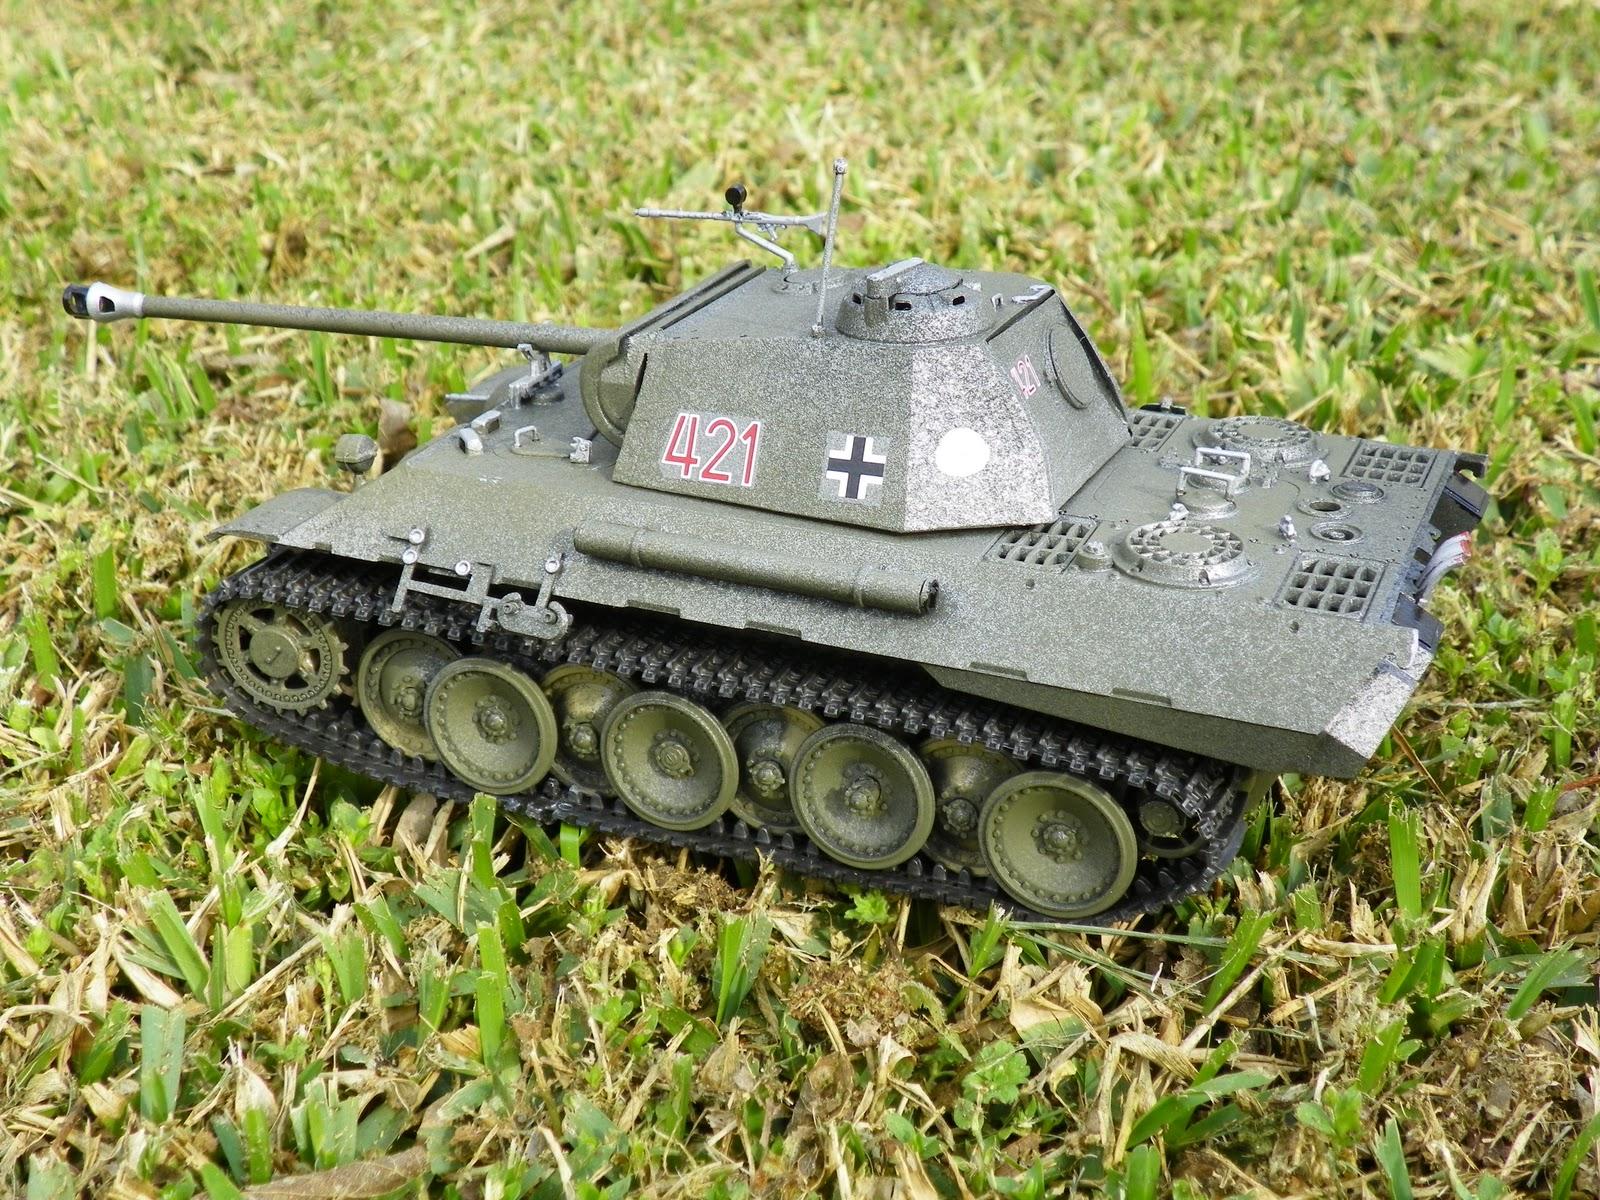 Underdog's Utterings: World War II German Mark V Panther Tank